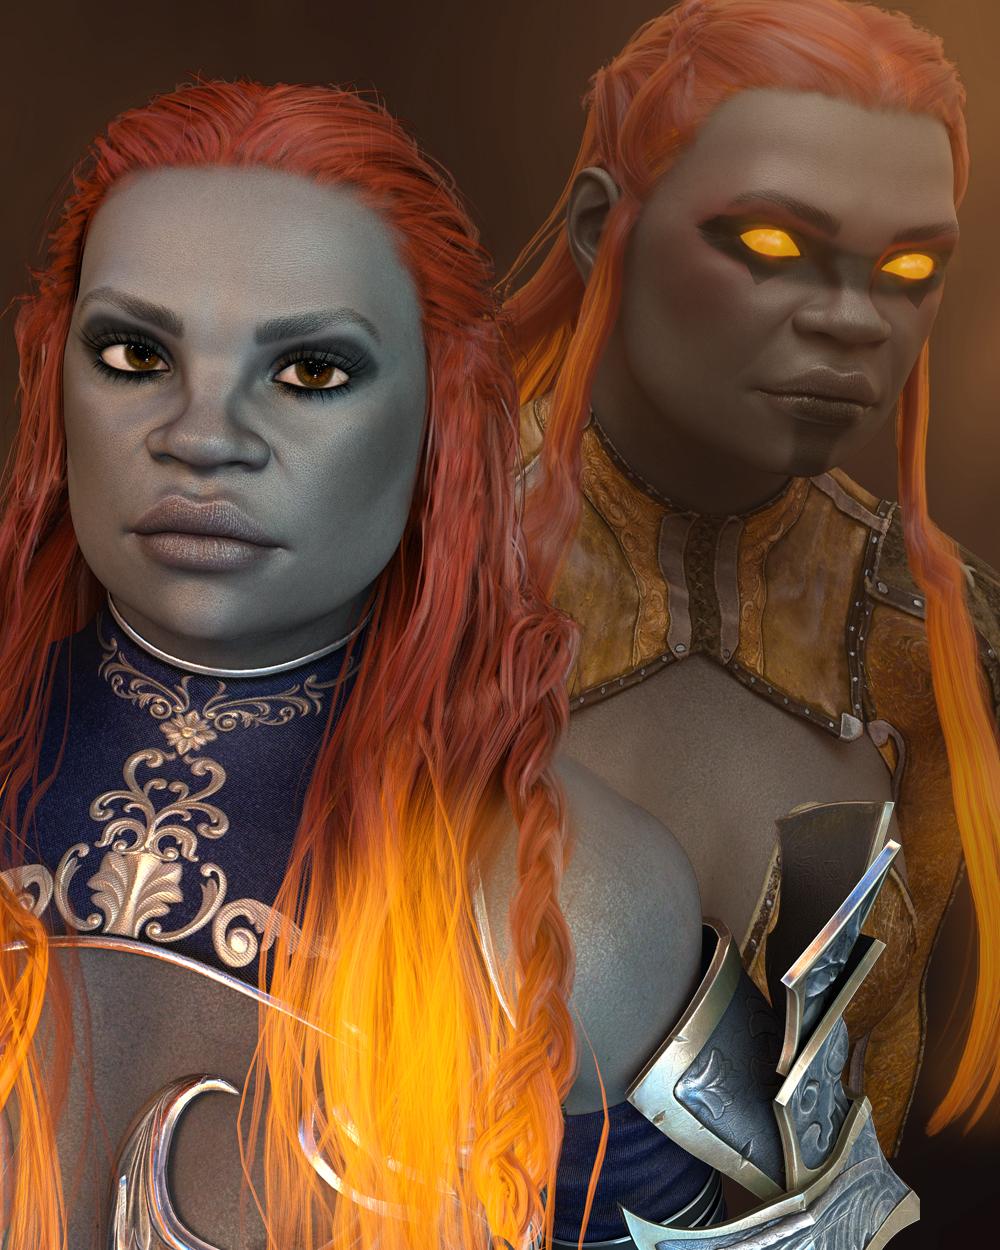 Gilrundi for Genesis 8 Female by: TwiztedMetal, 3D Models by Daz 3D